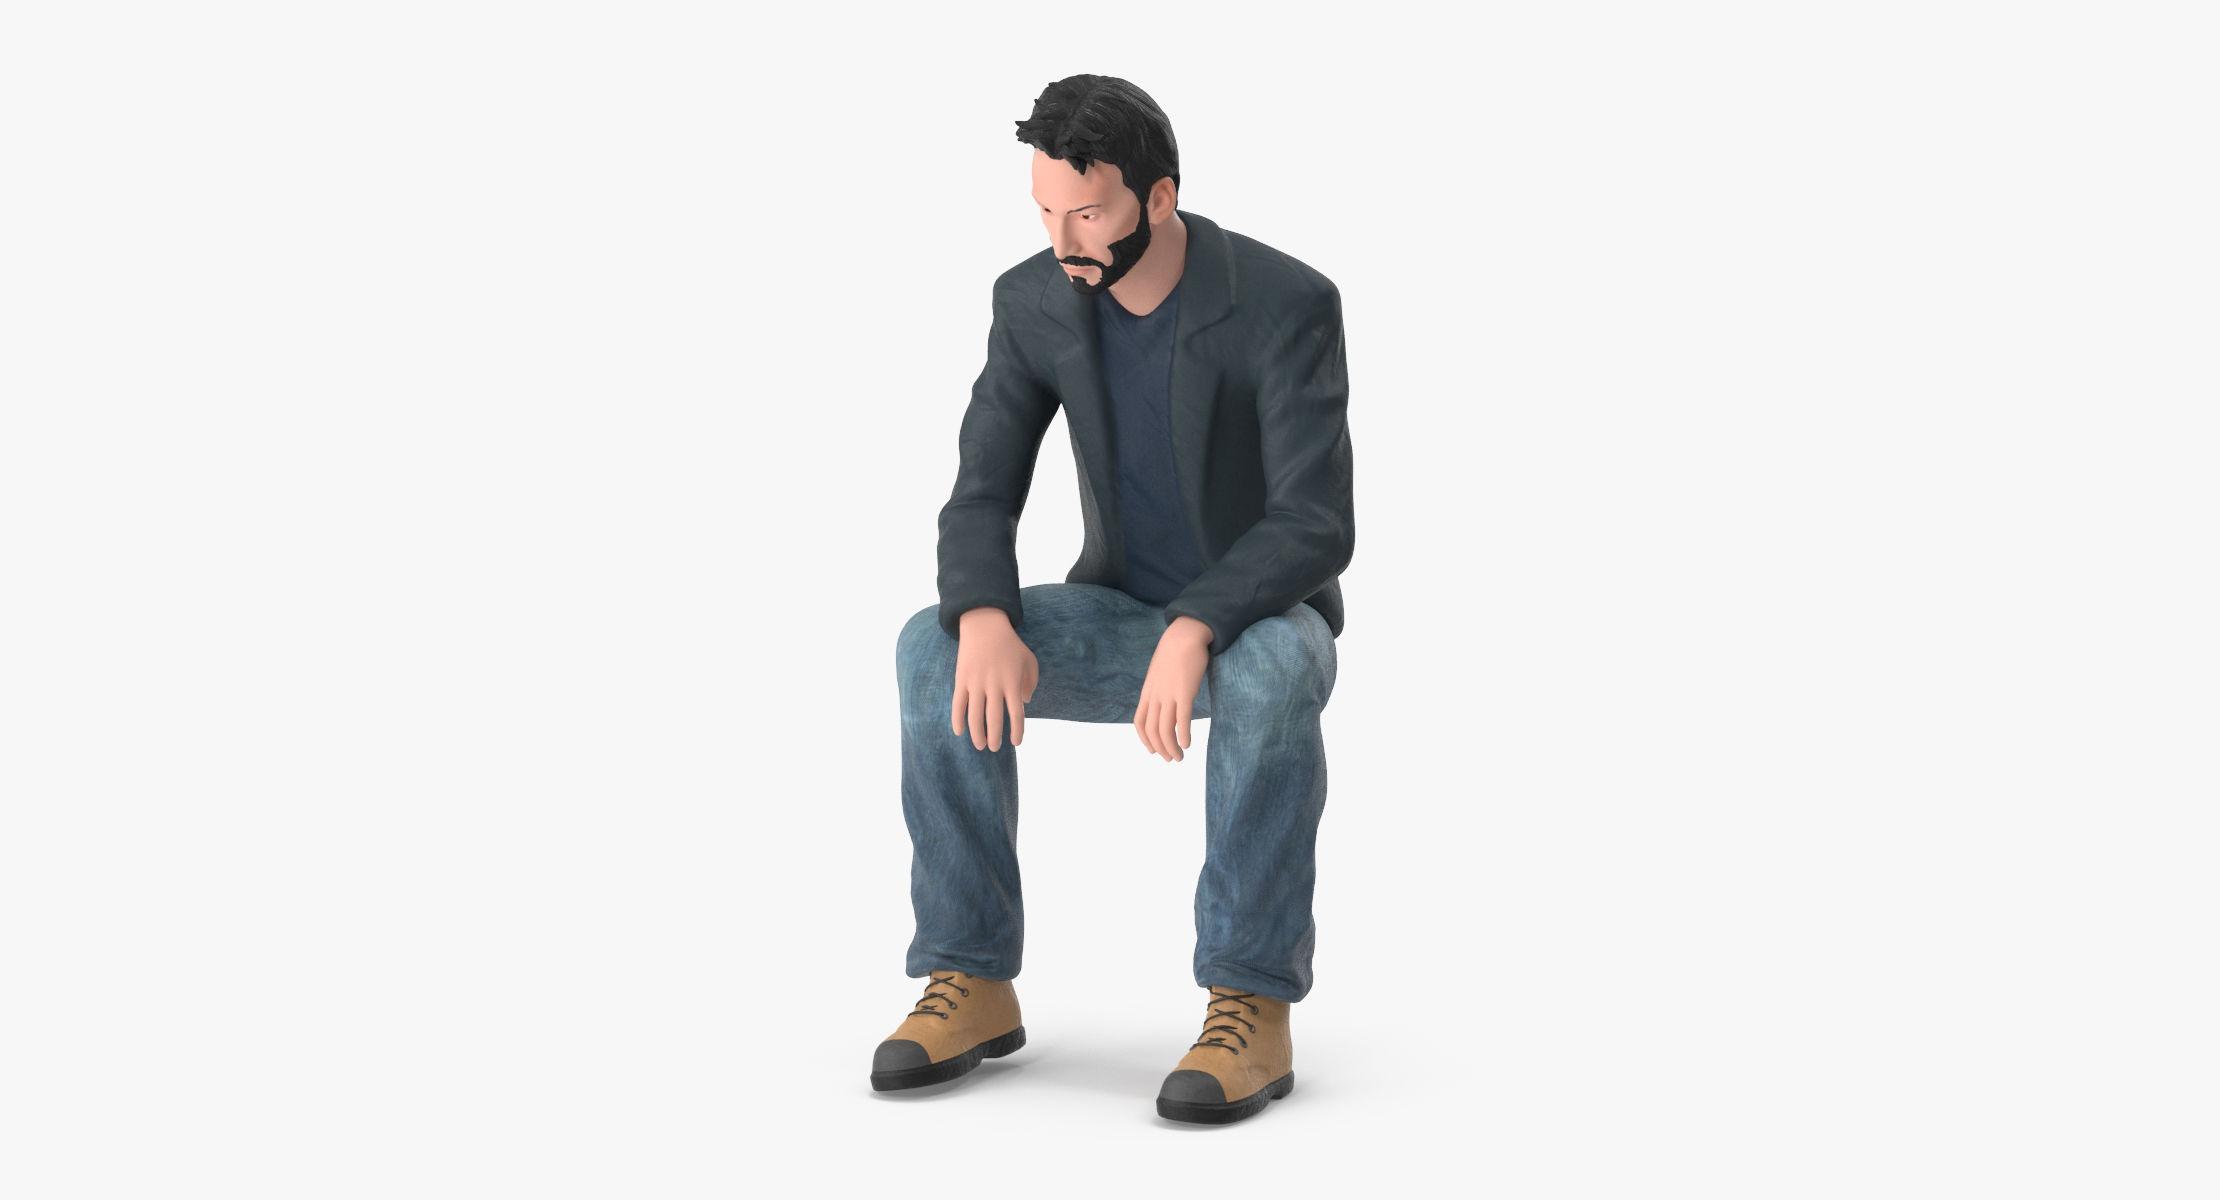 Sad Keanu - reel 1